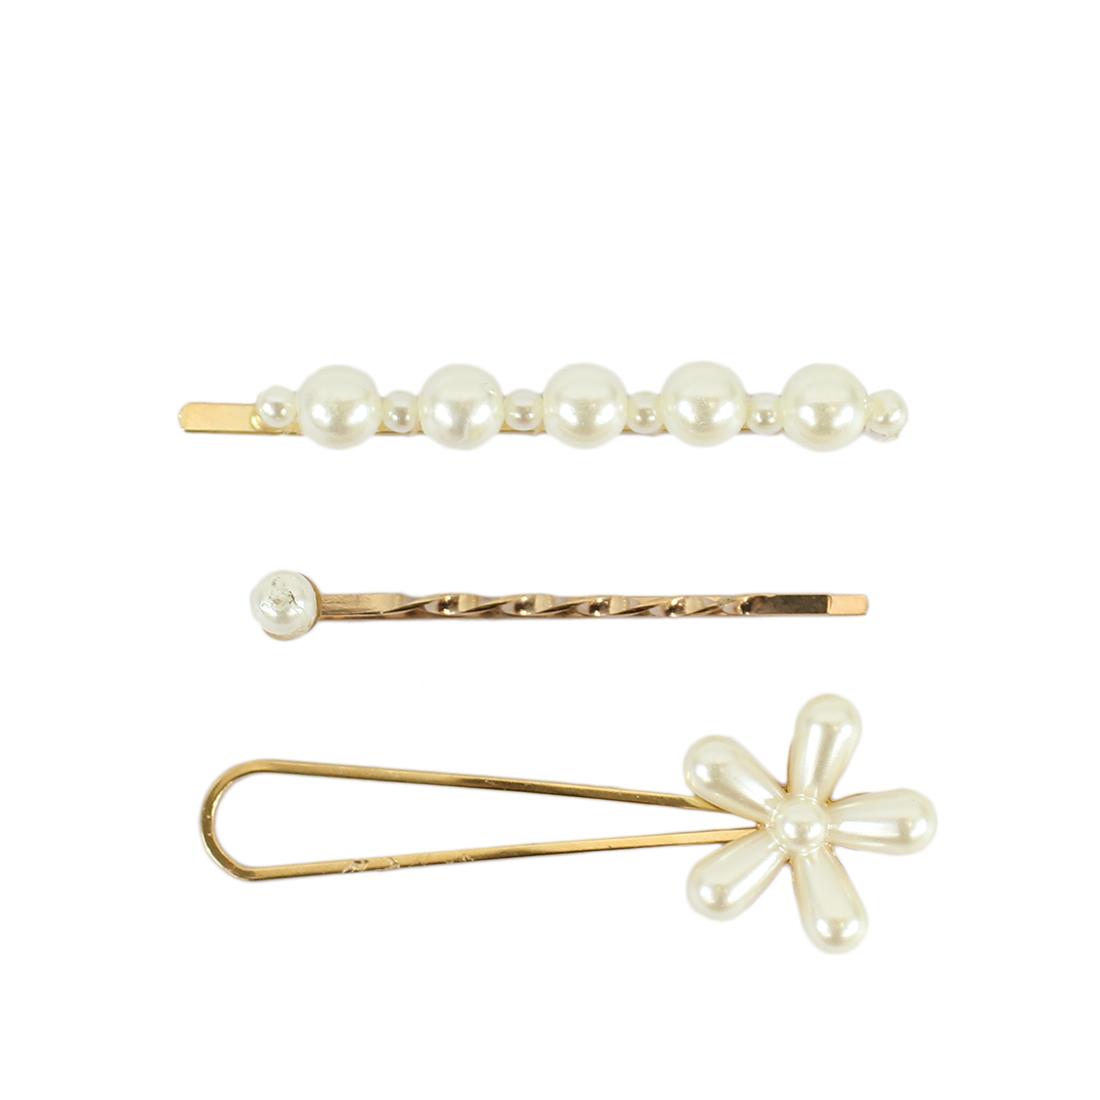 Big & small pearls